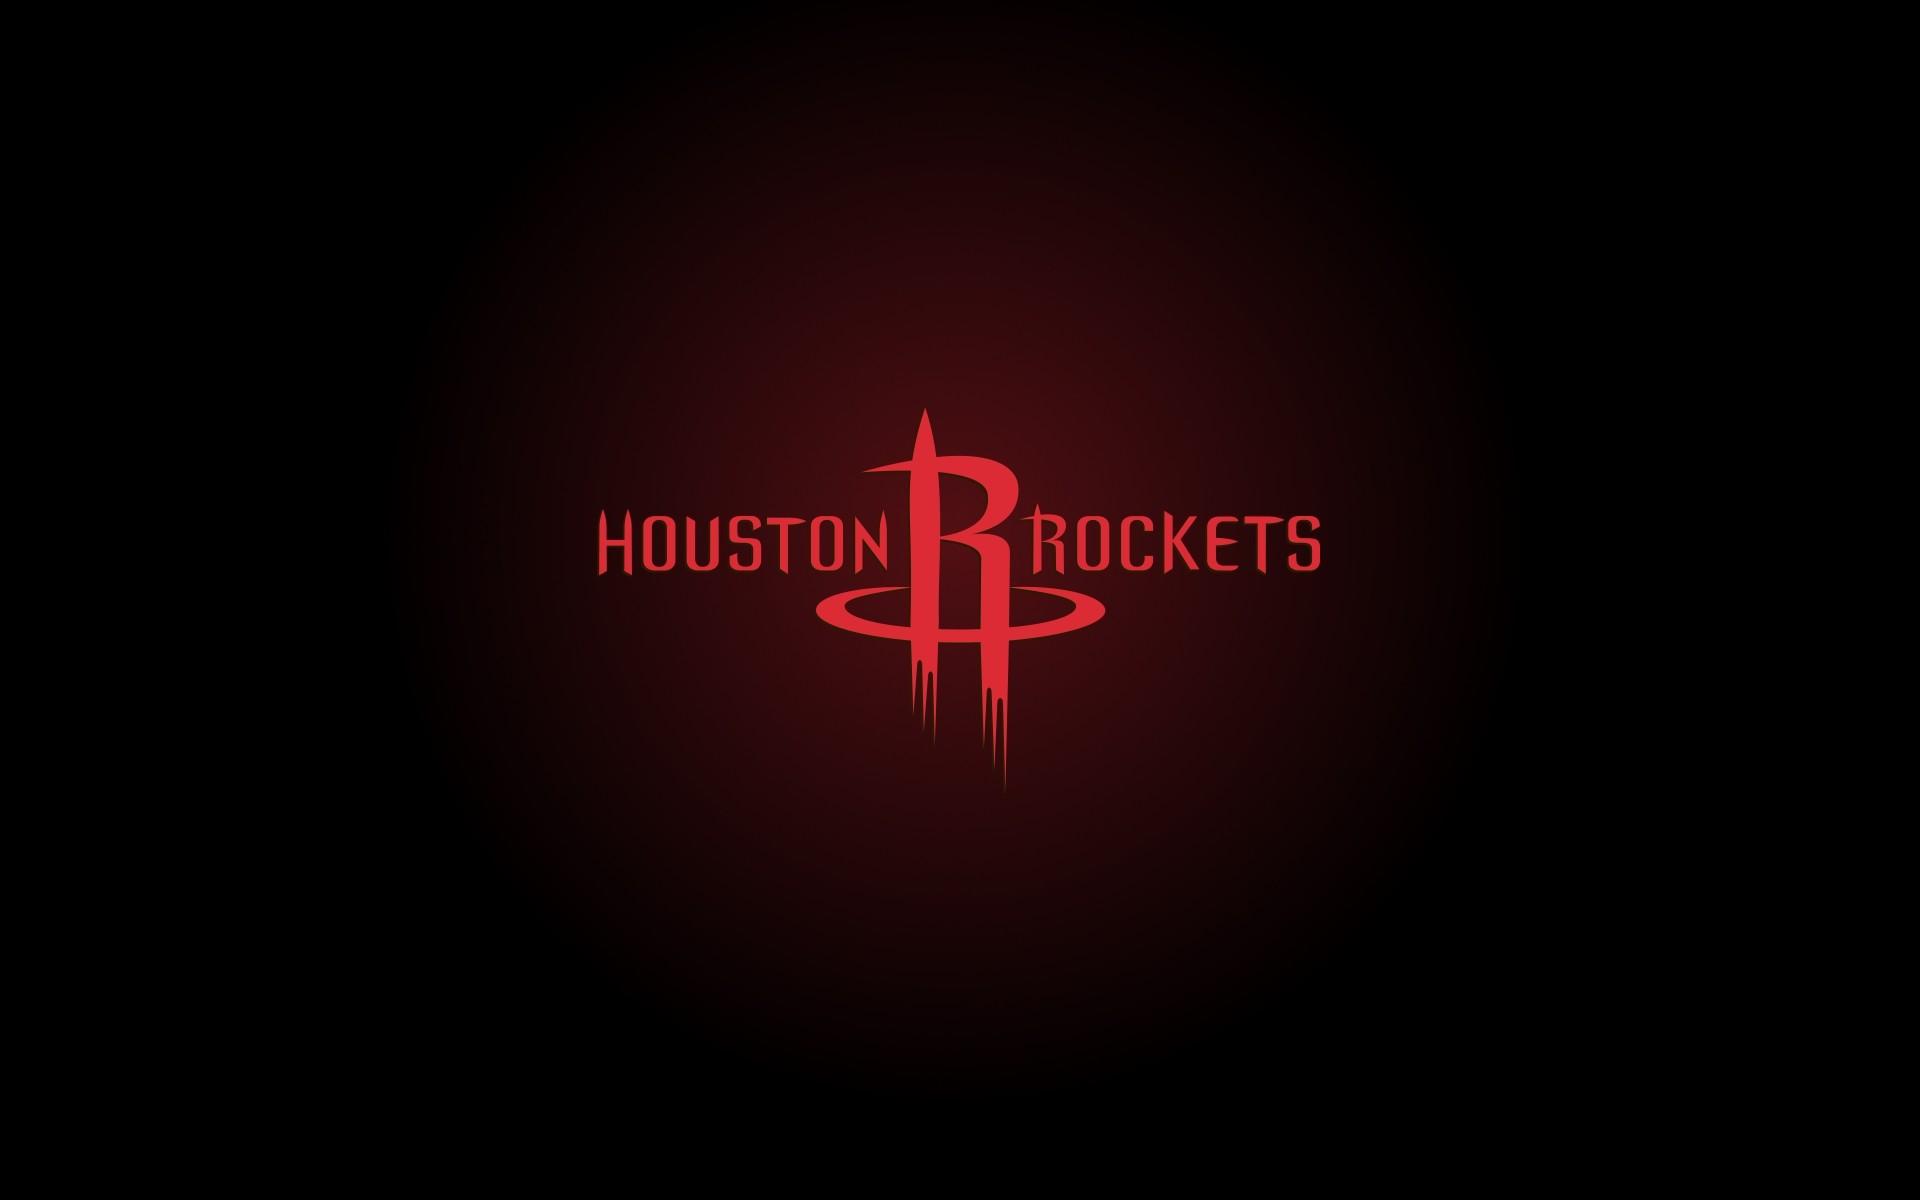 Houston Rockets wallpaper and logo, widescreen px